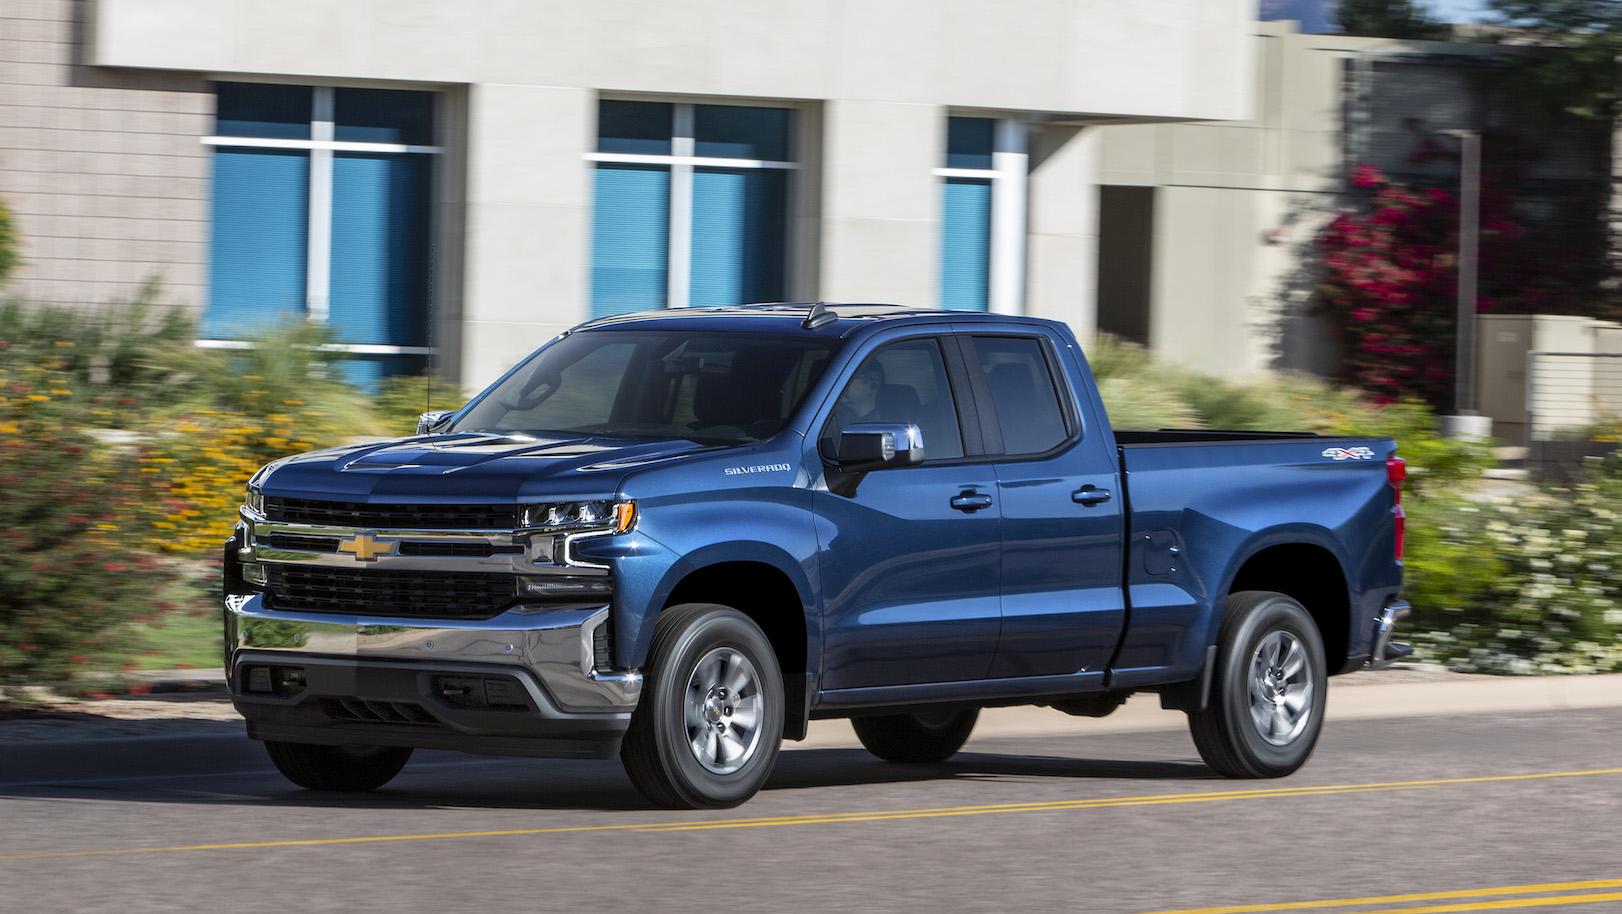 A blue 2019 Chevrolet Silverado, a full-size pickup truck.